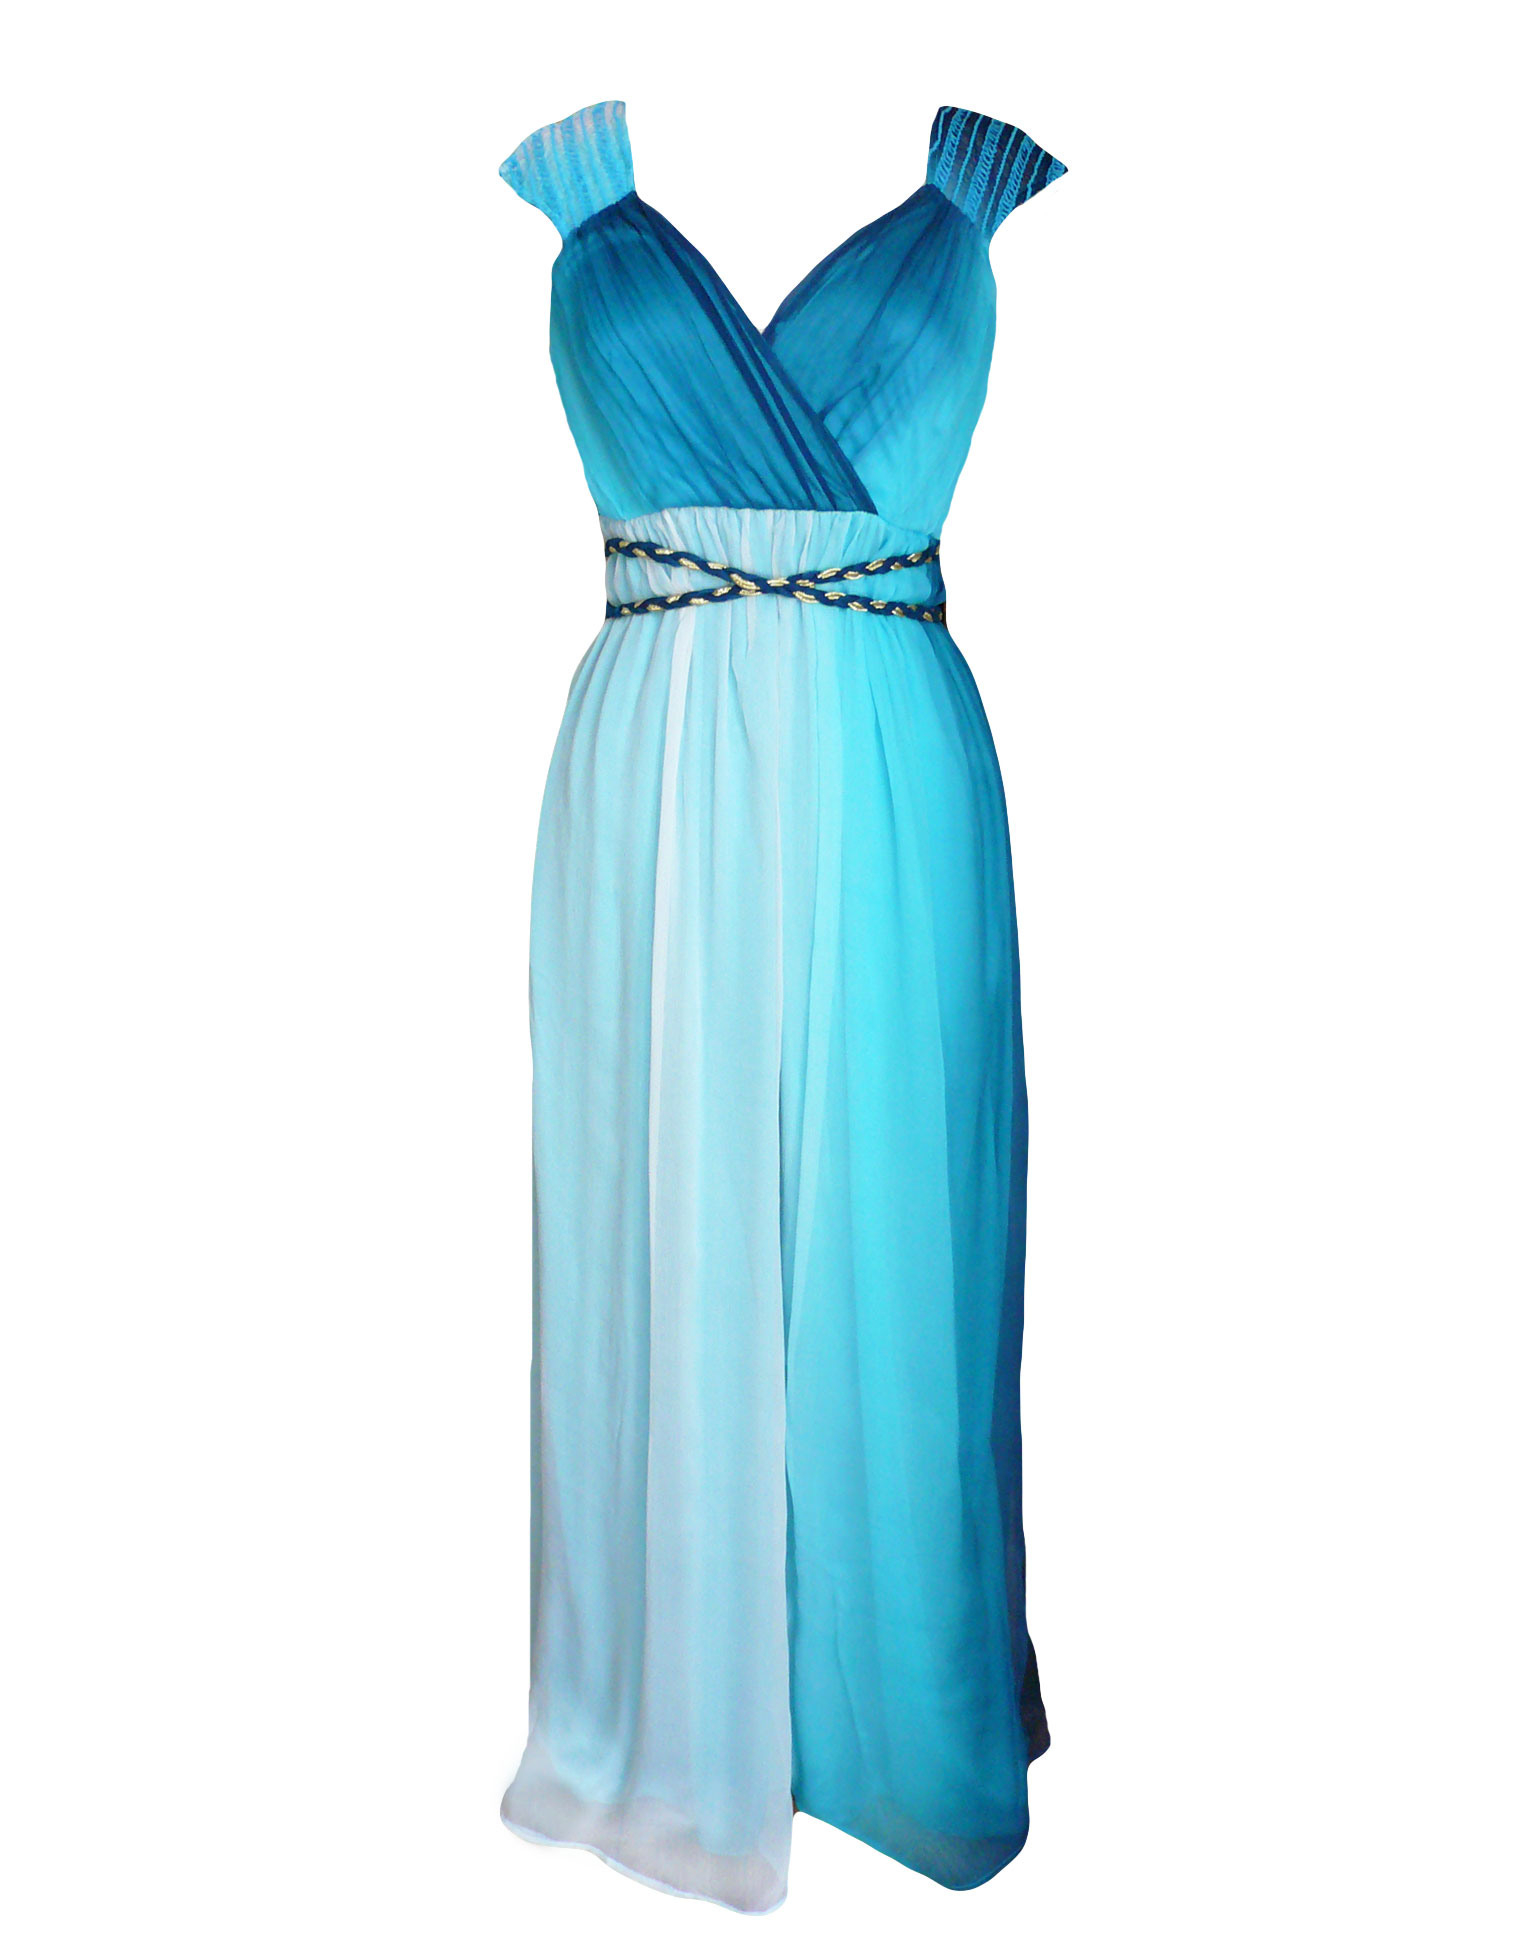 Kleid Maxi  Angebote Auf Waterige